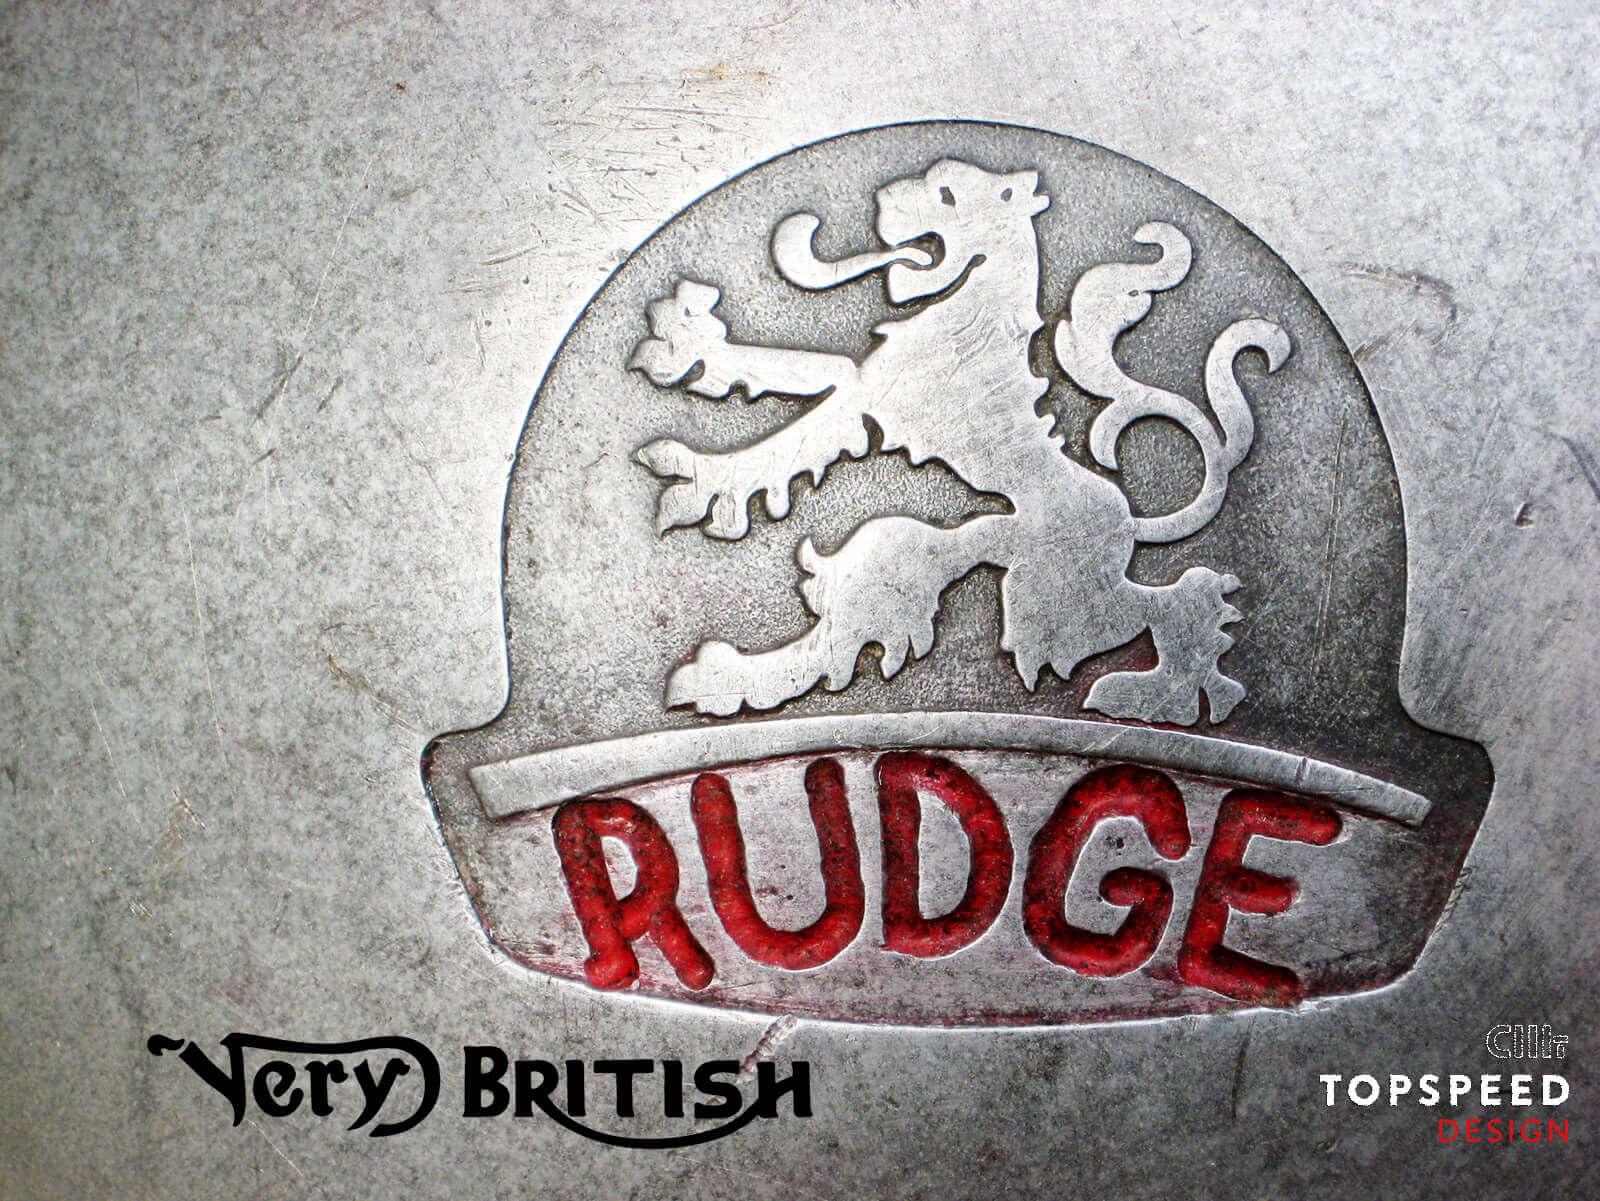 Very British...do you like it? Rudge | Topspeed-Design by Bernhard Schmidt